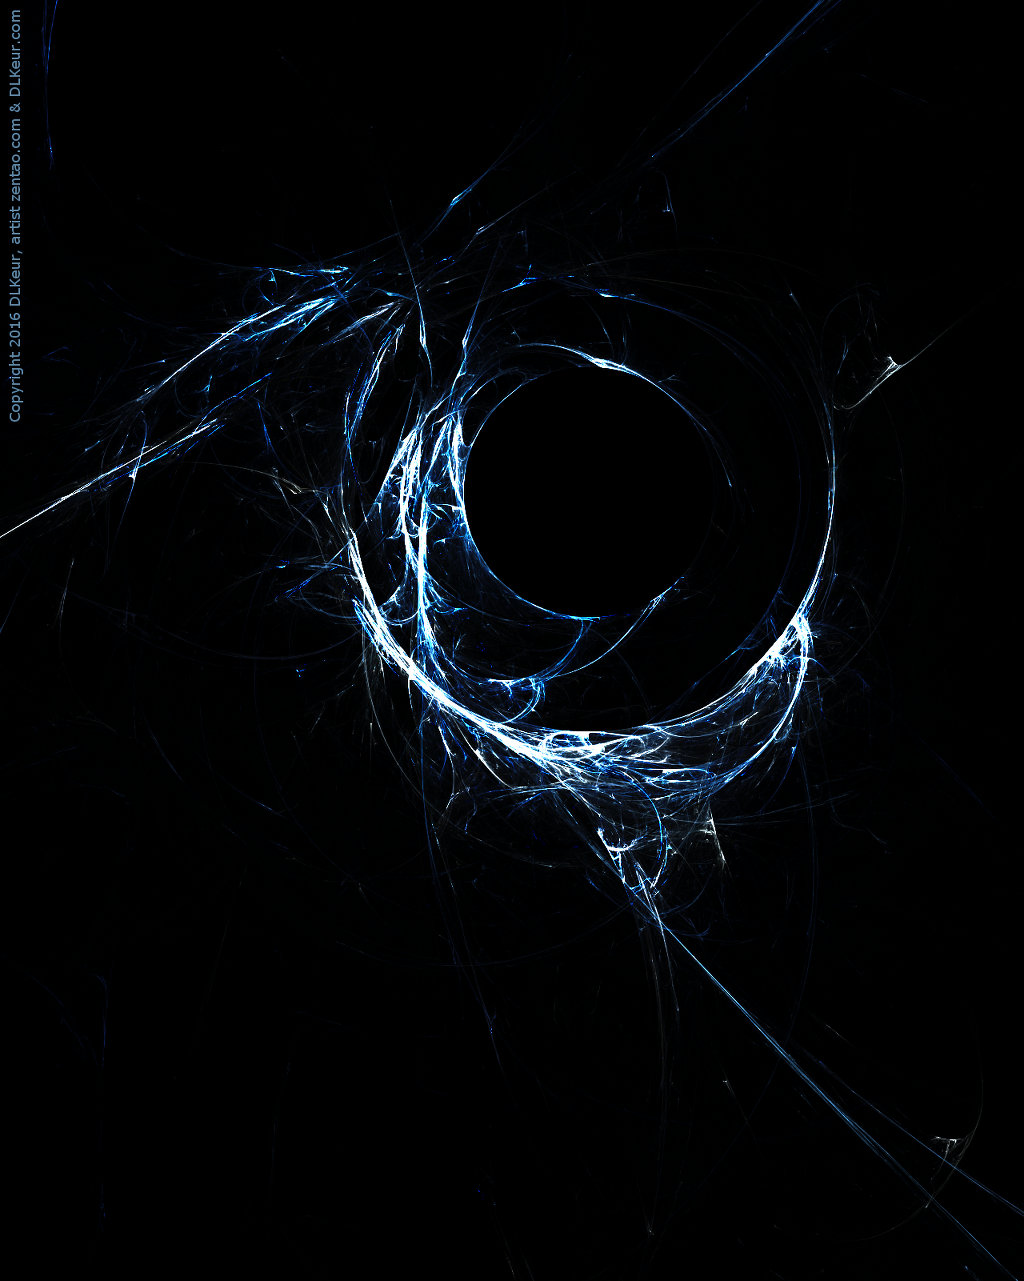 bullet hole, copyright 2016 DLKeurLKeur2016_web